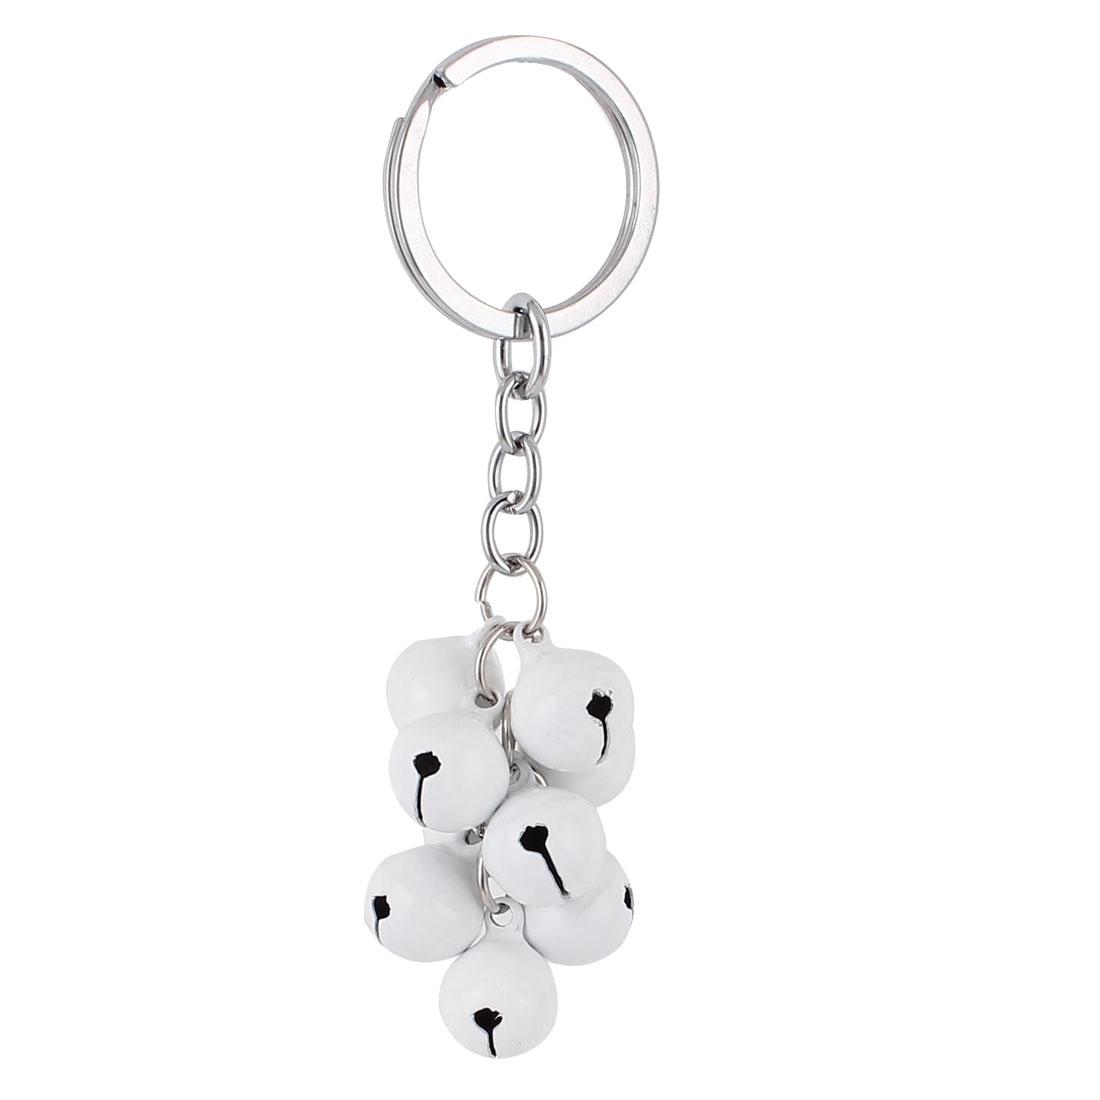 White Metal Bells Pendant Split Ring Keyring Keychain Key Chain Hanging Purse Ornament